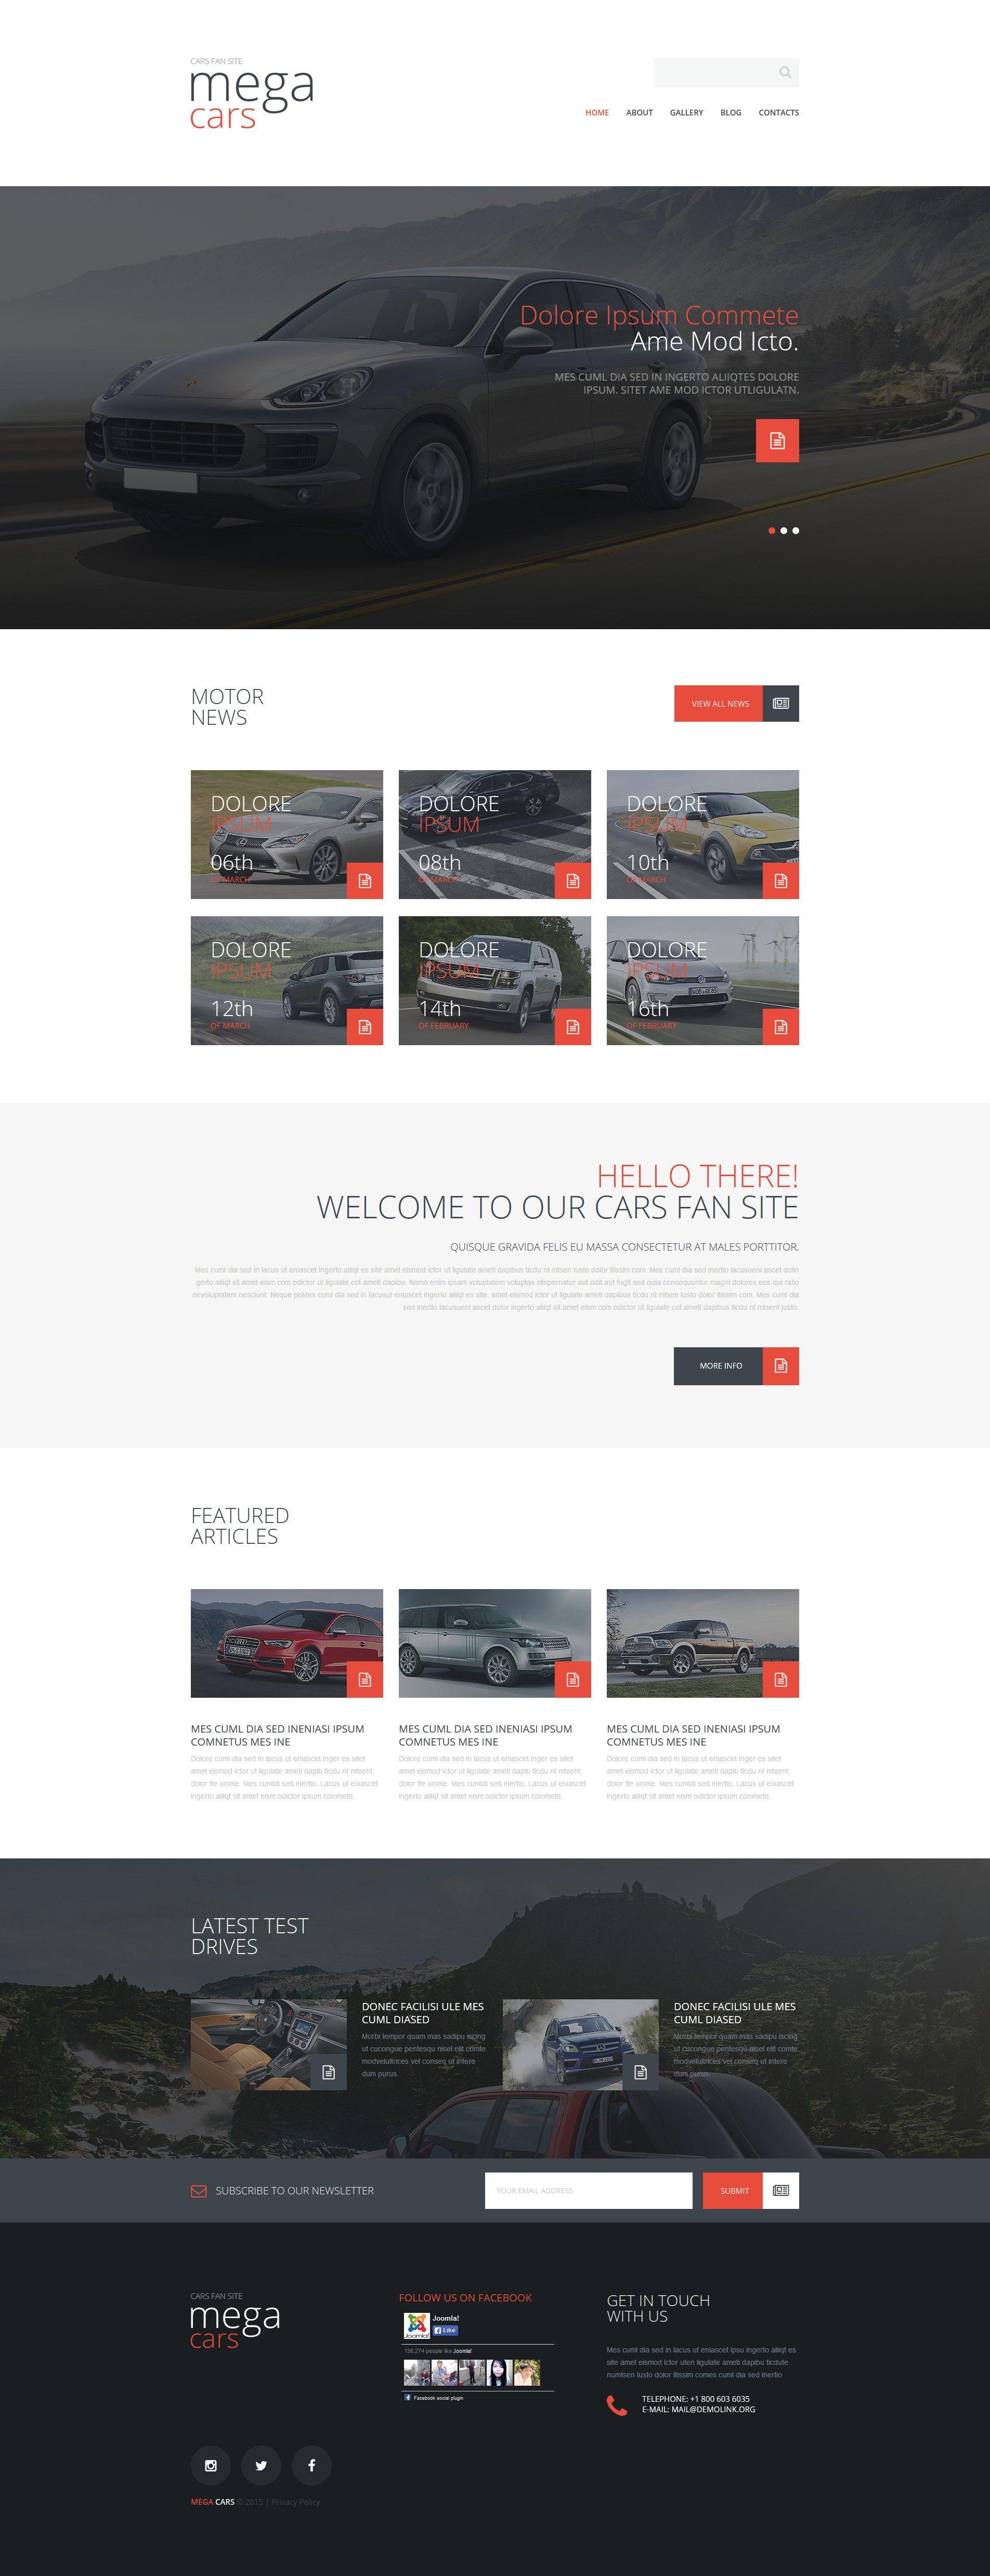 Responsivt Cars Fan Site Joomla-mall #53641